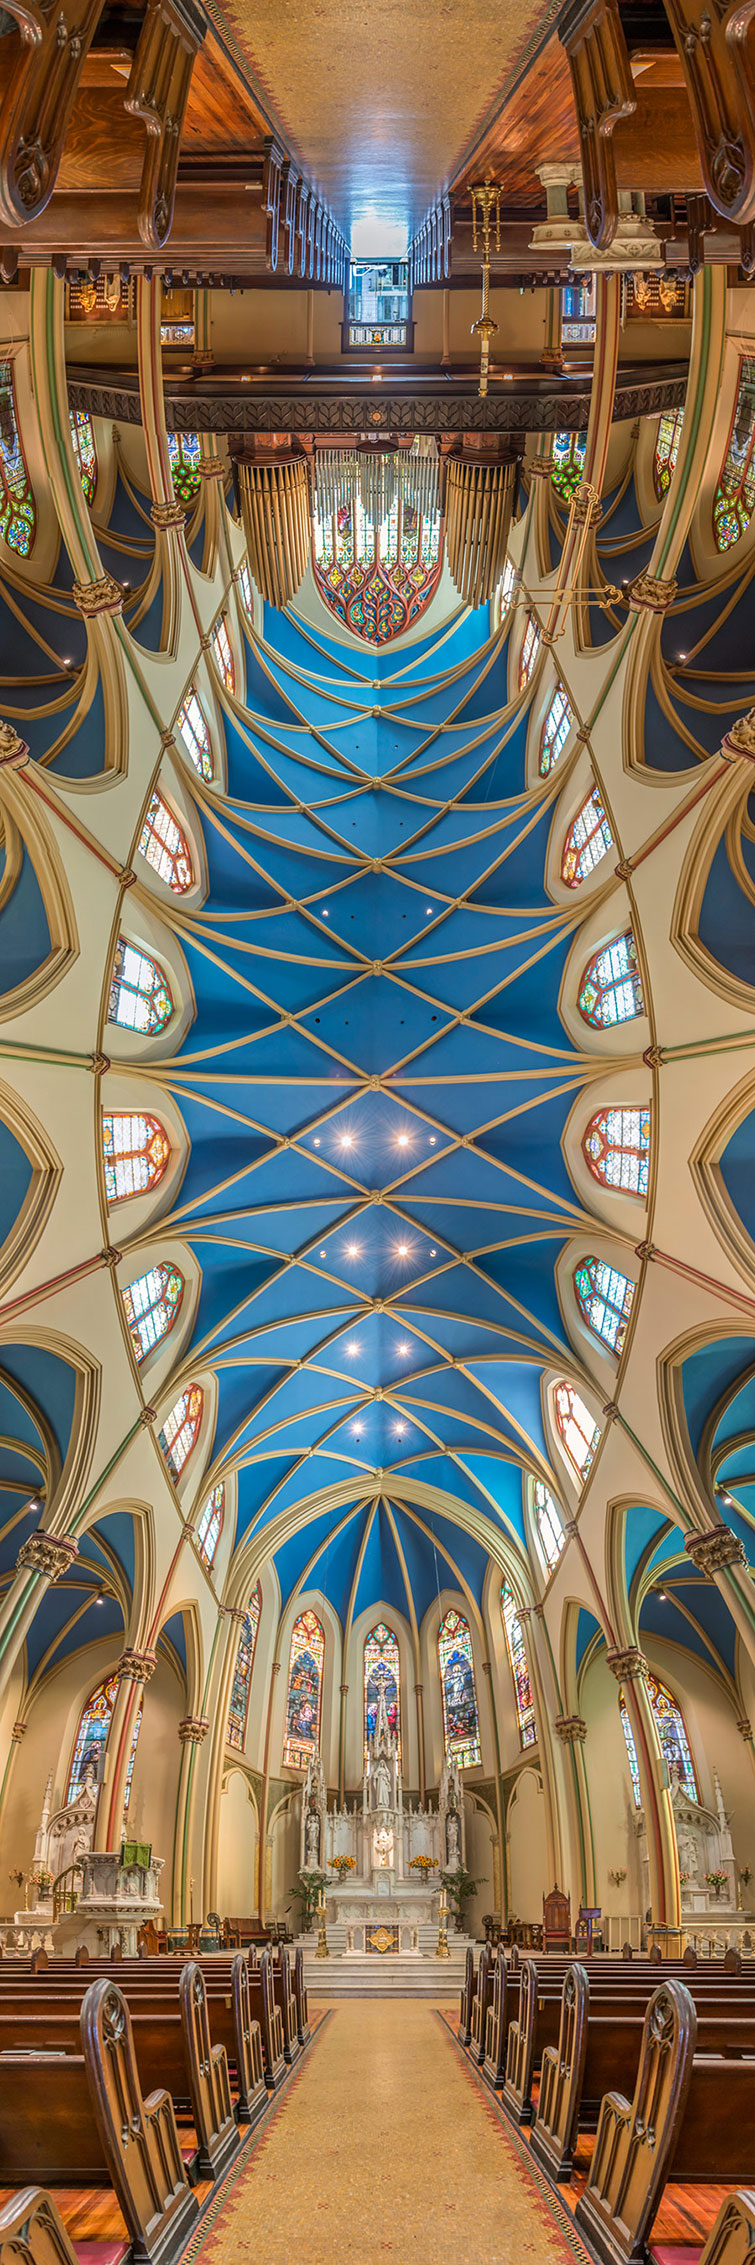 St. Monica's Church